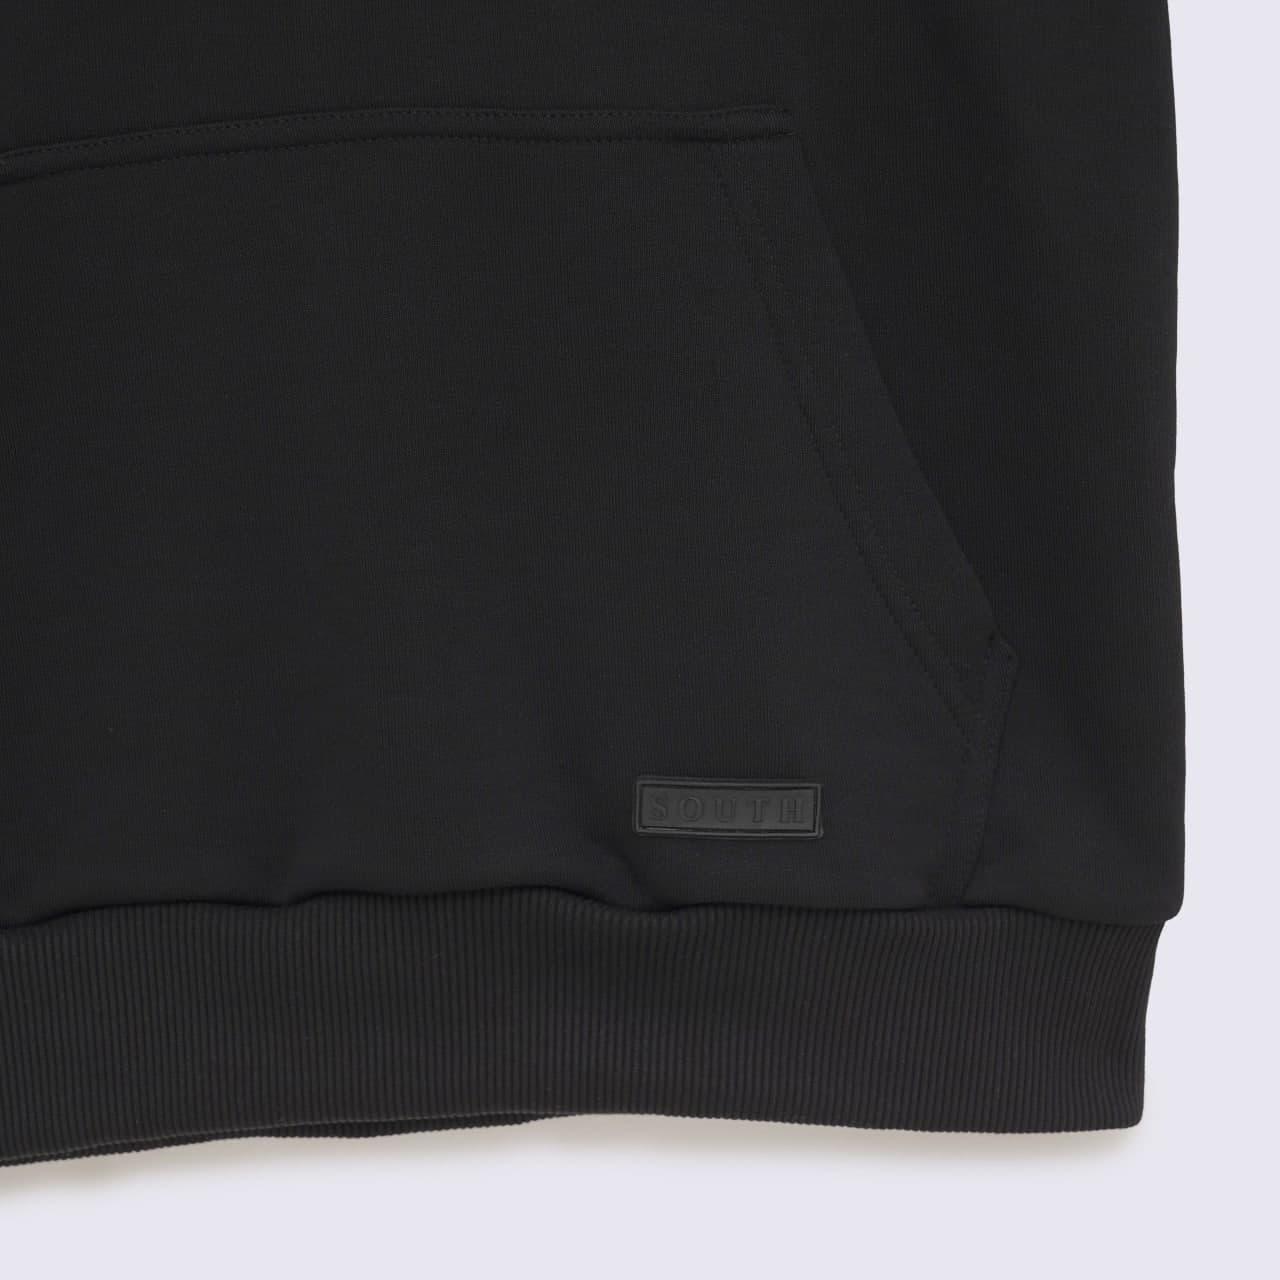 Худи с капюшоном South basik black  - фото 5